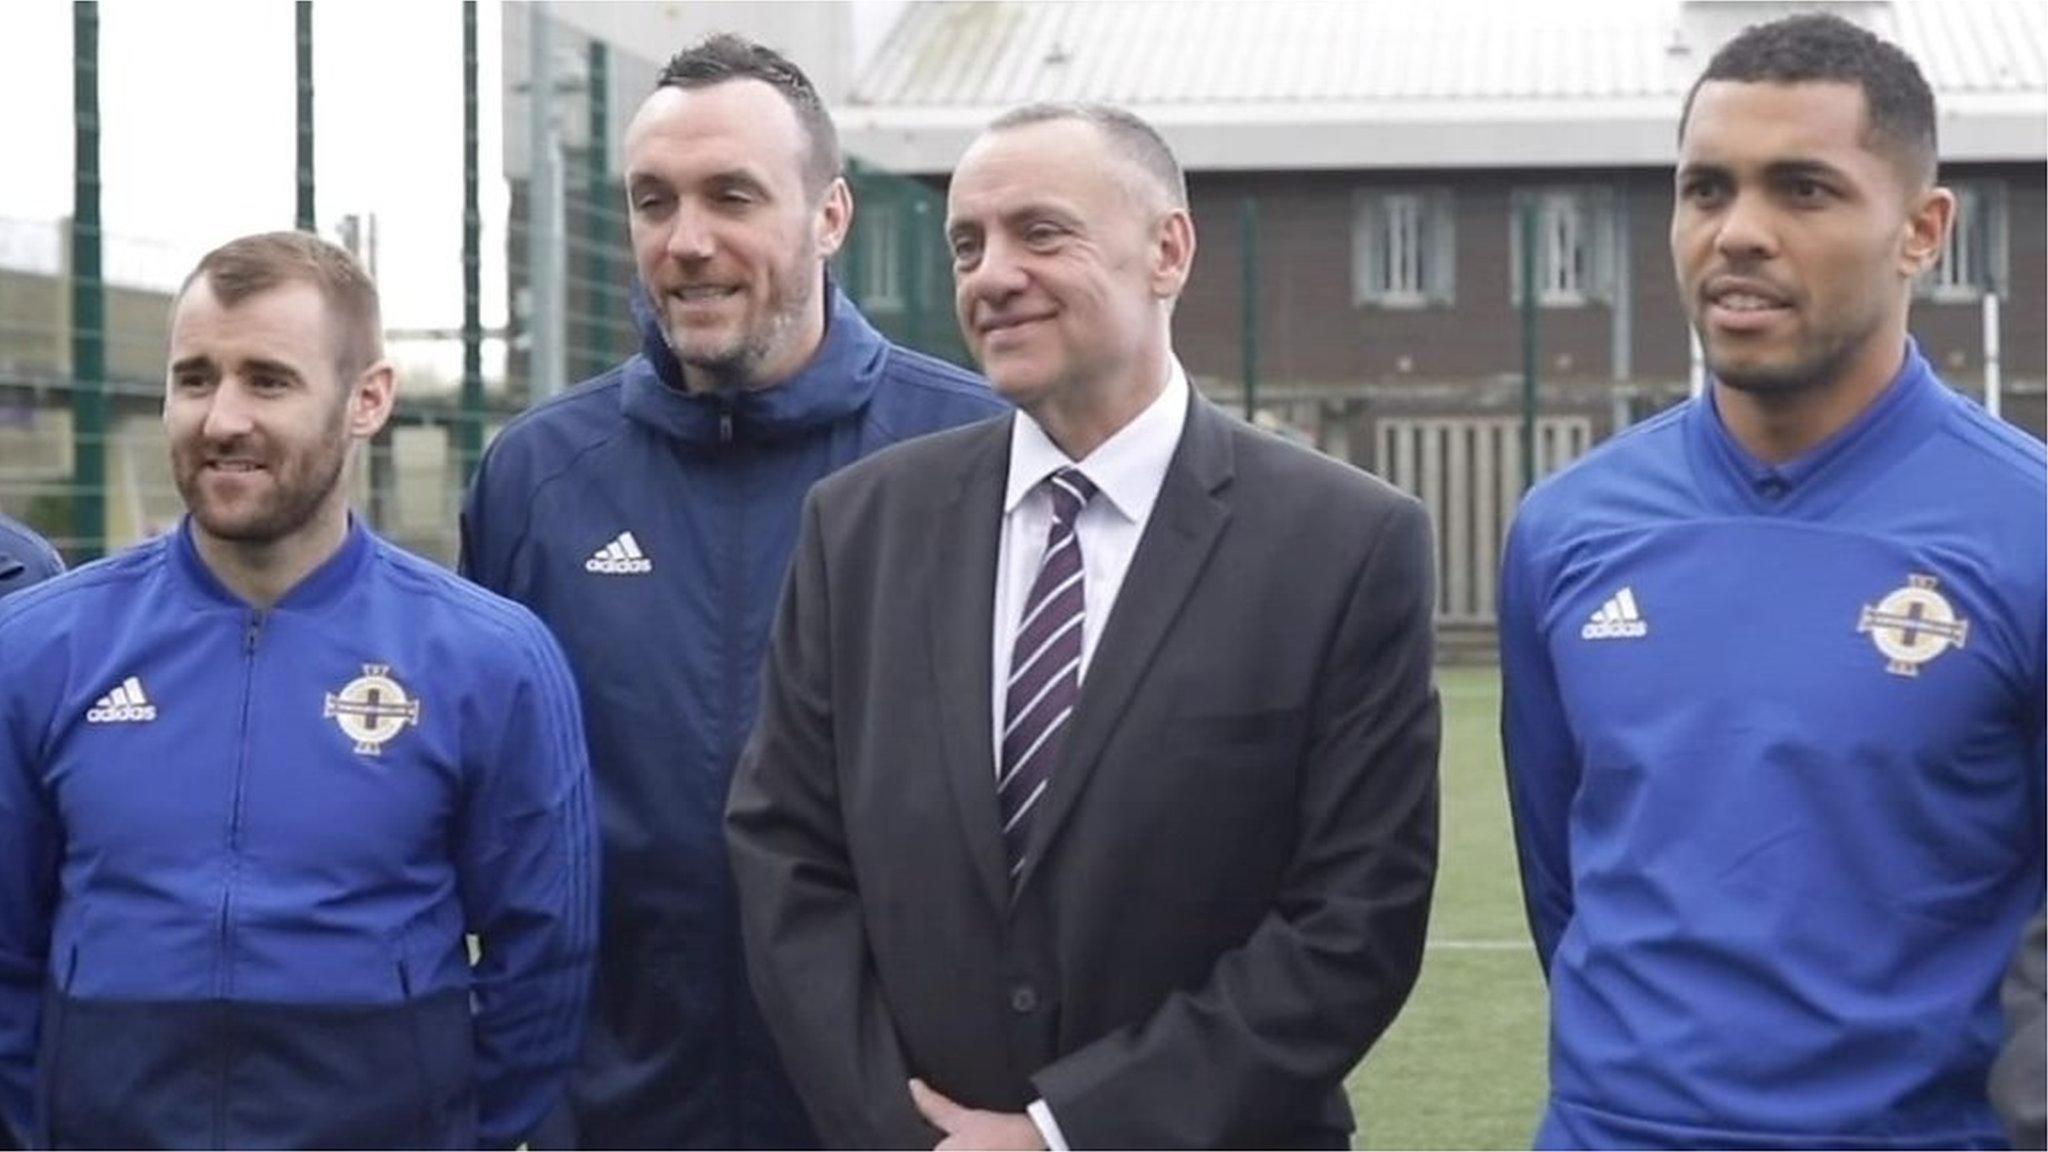 Northern Ireland's Magennis and McGinn back football scheme for prison inmates